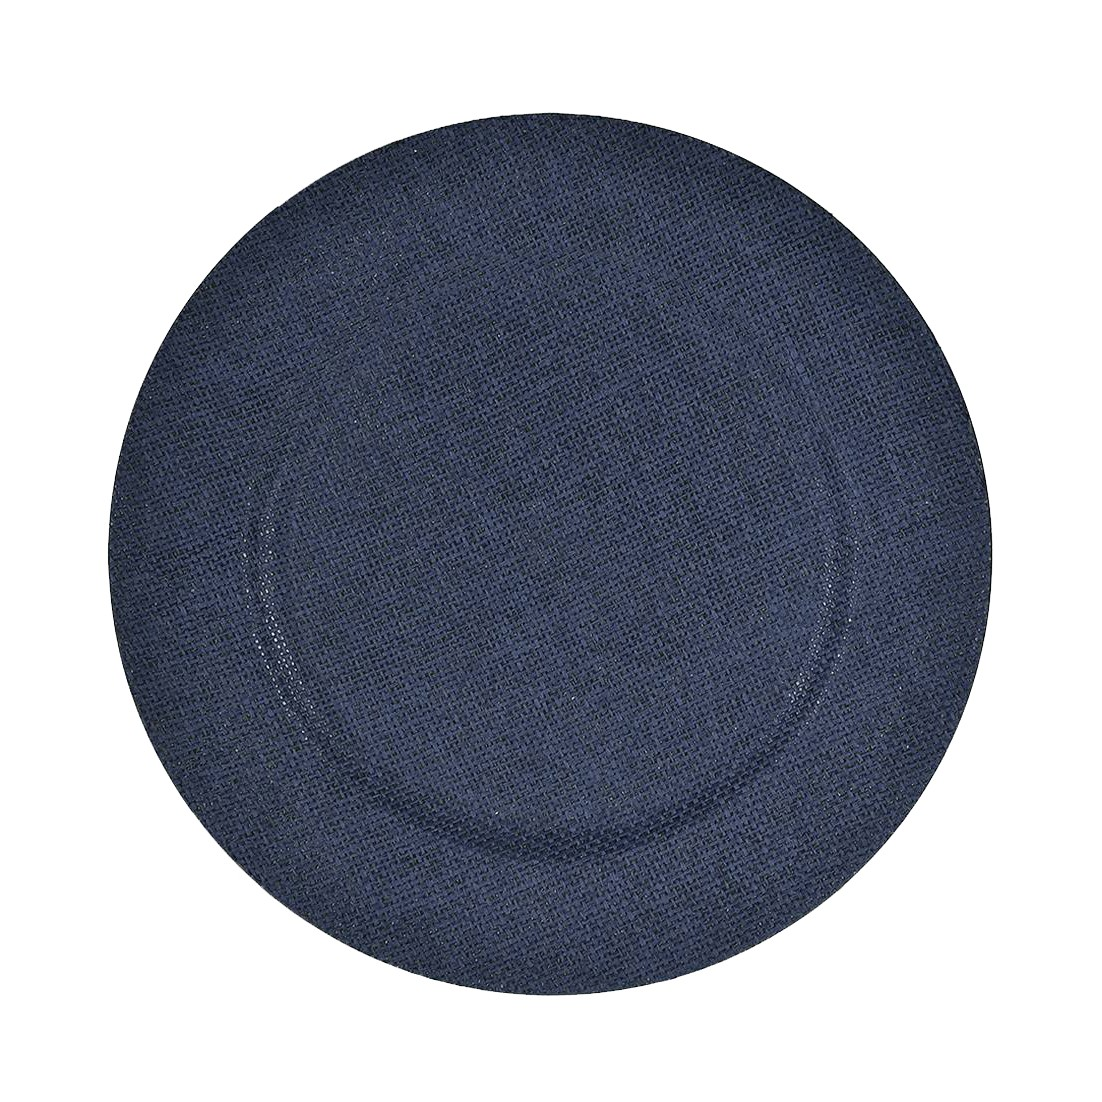 Sousplat Redondo Plastico 33cm Azul 44619-001 - G Presentes